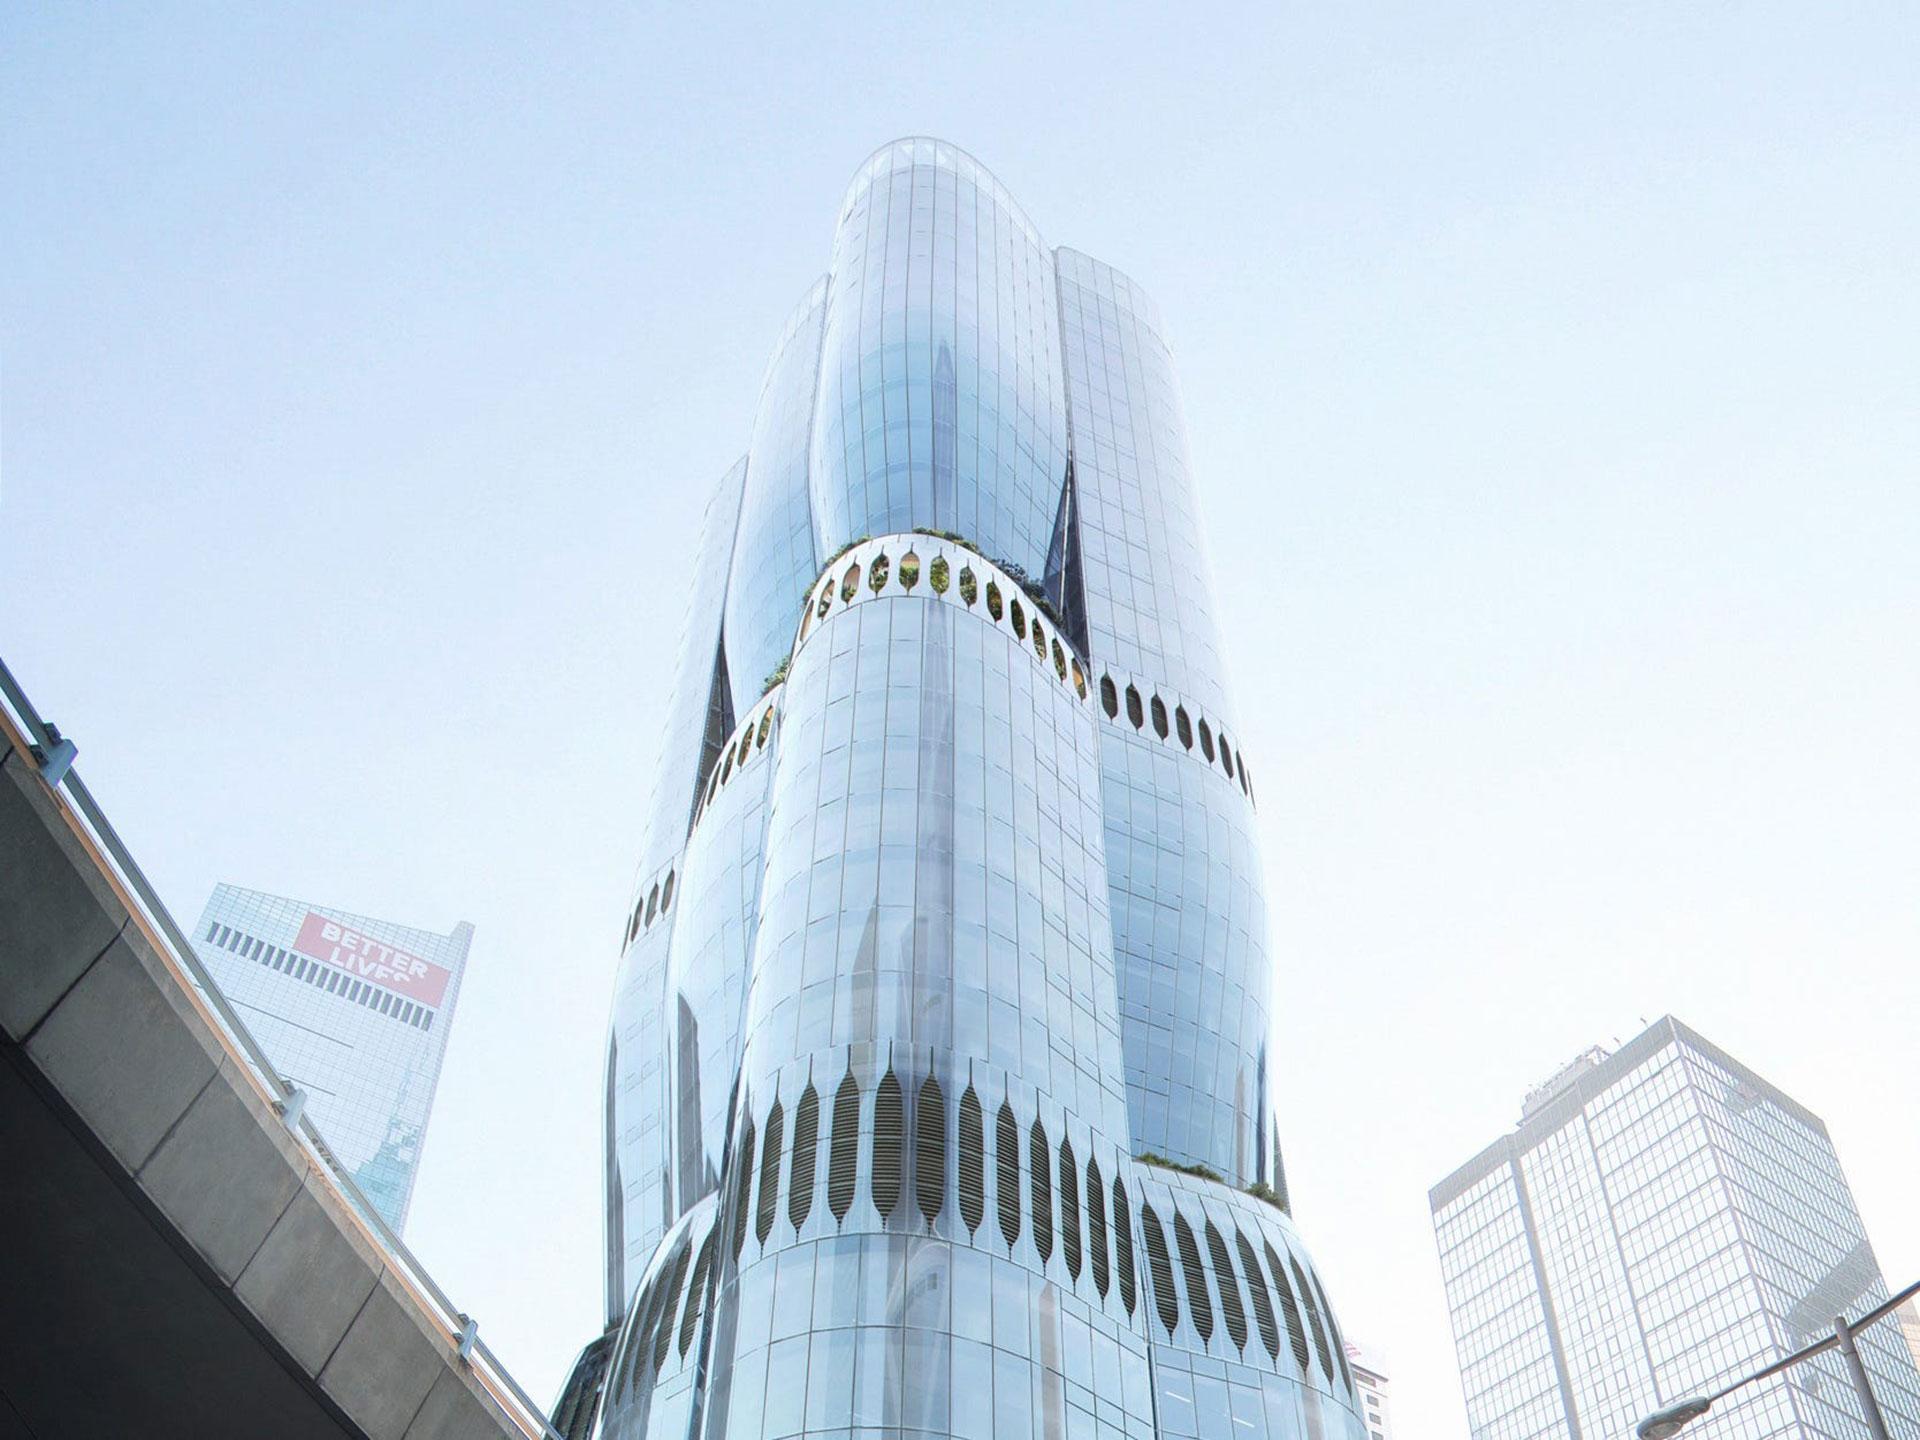 Zaha Hadid Architects построит небоскреб на самом дорогом участке земли в мире